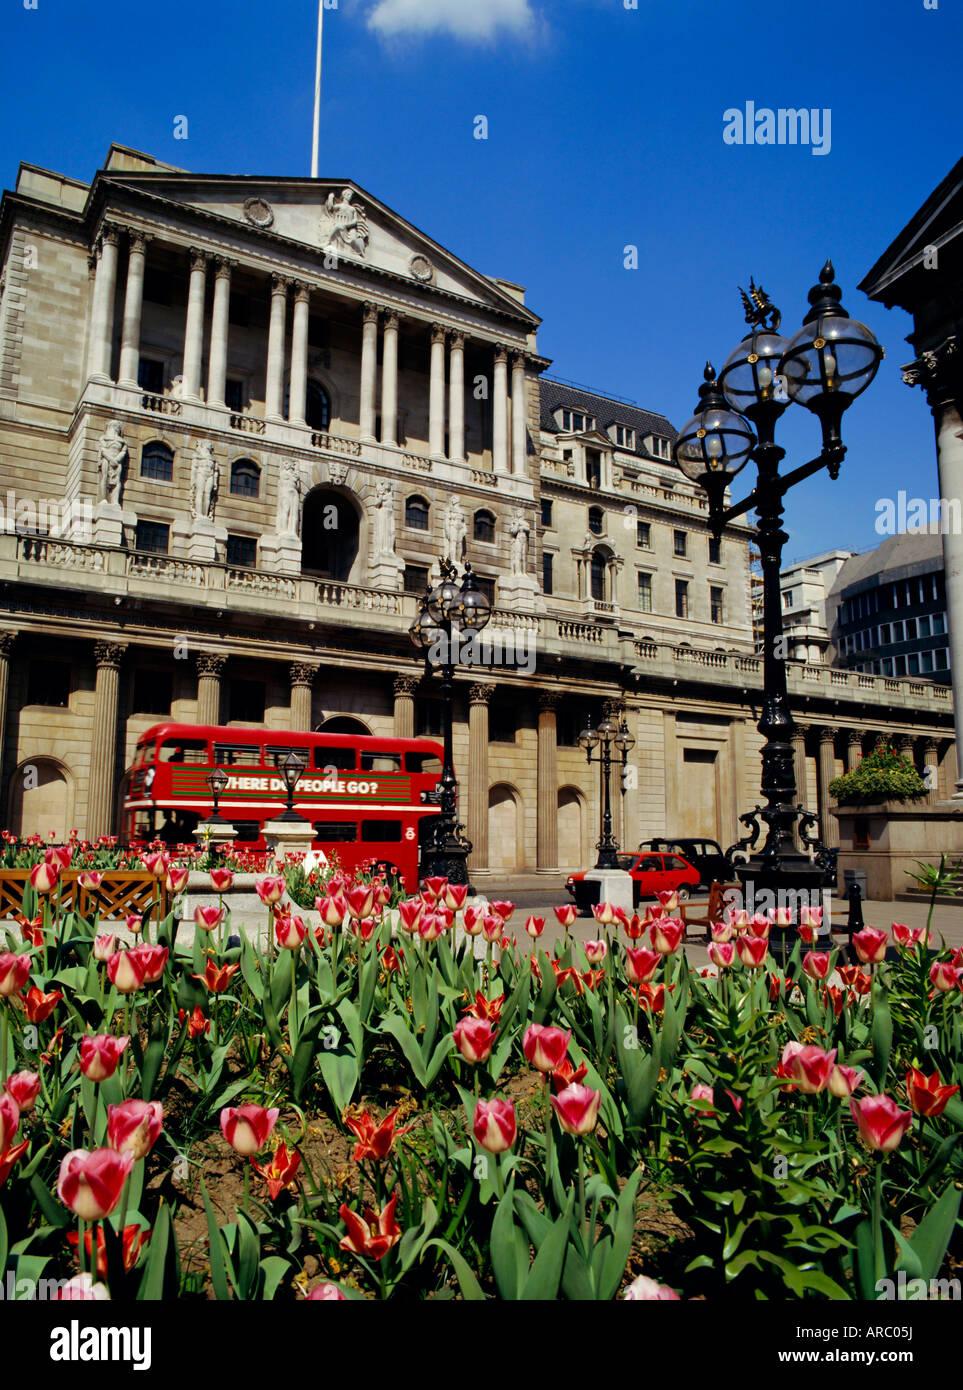 The Bank of England, Threadneedle Street, City of London, England, UK - Stock Image